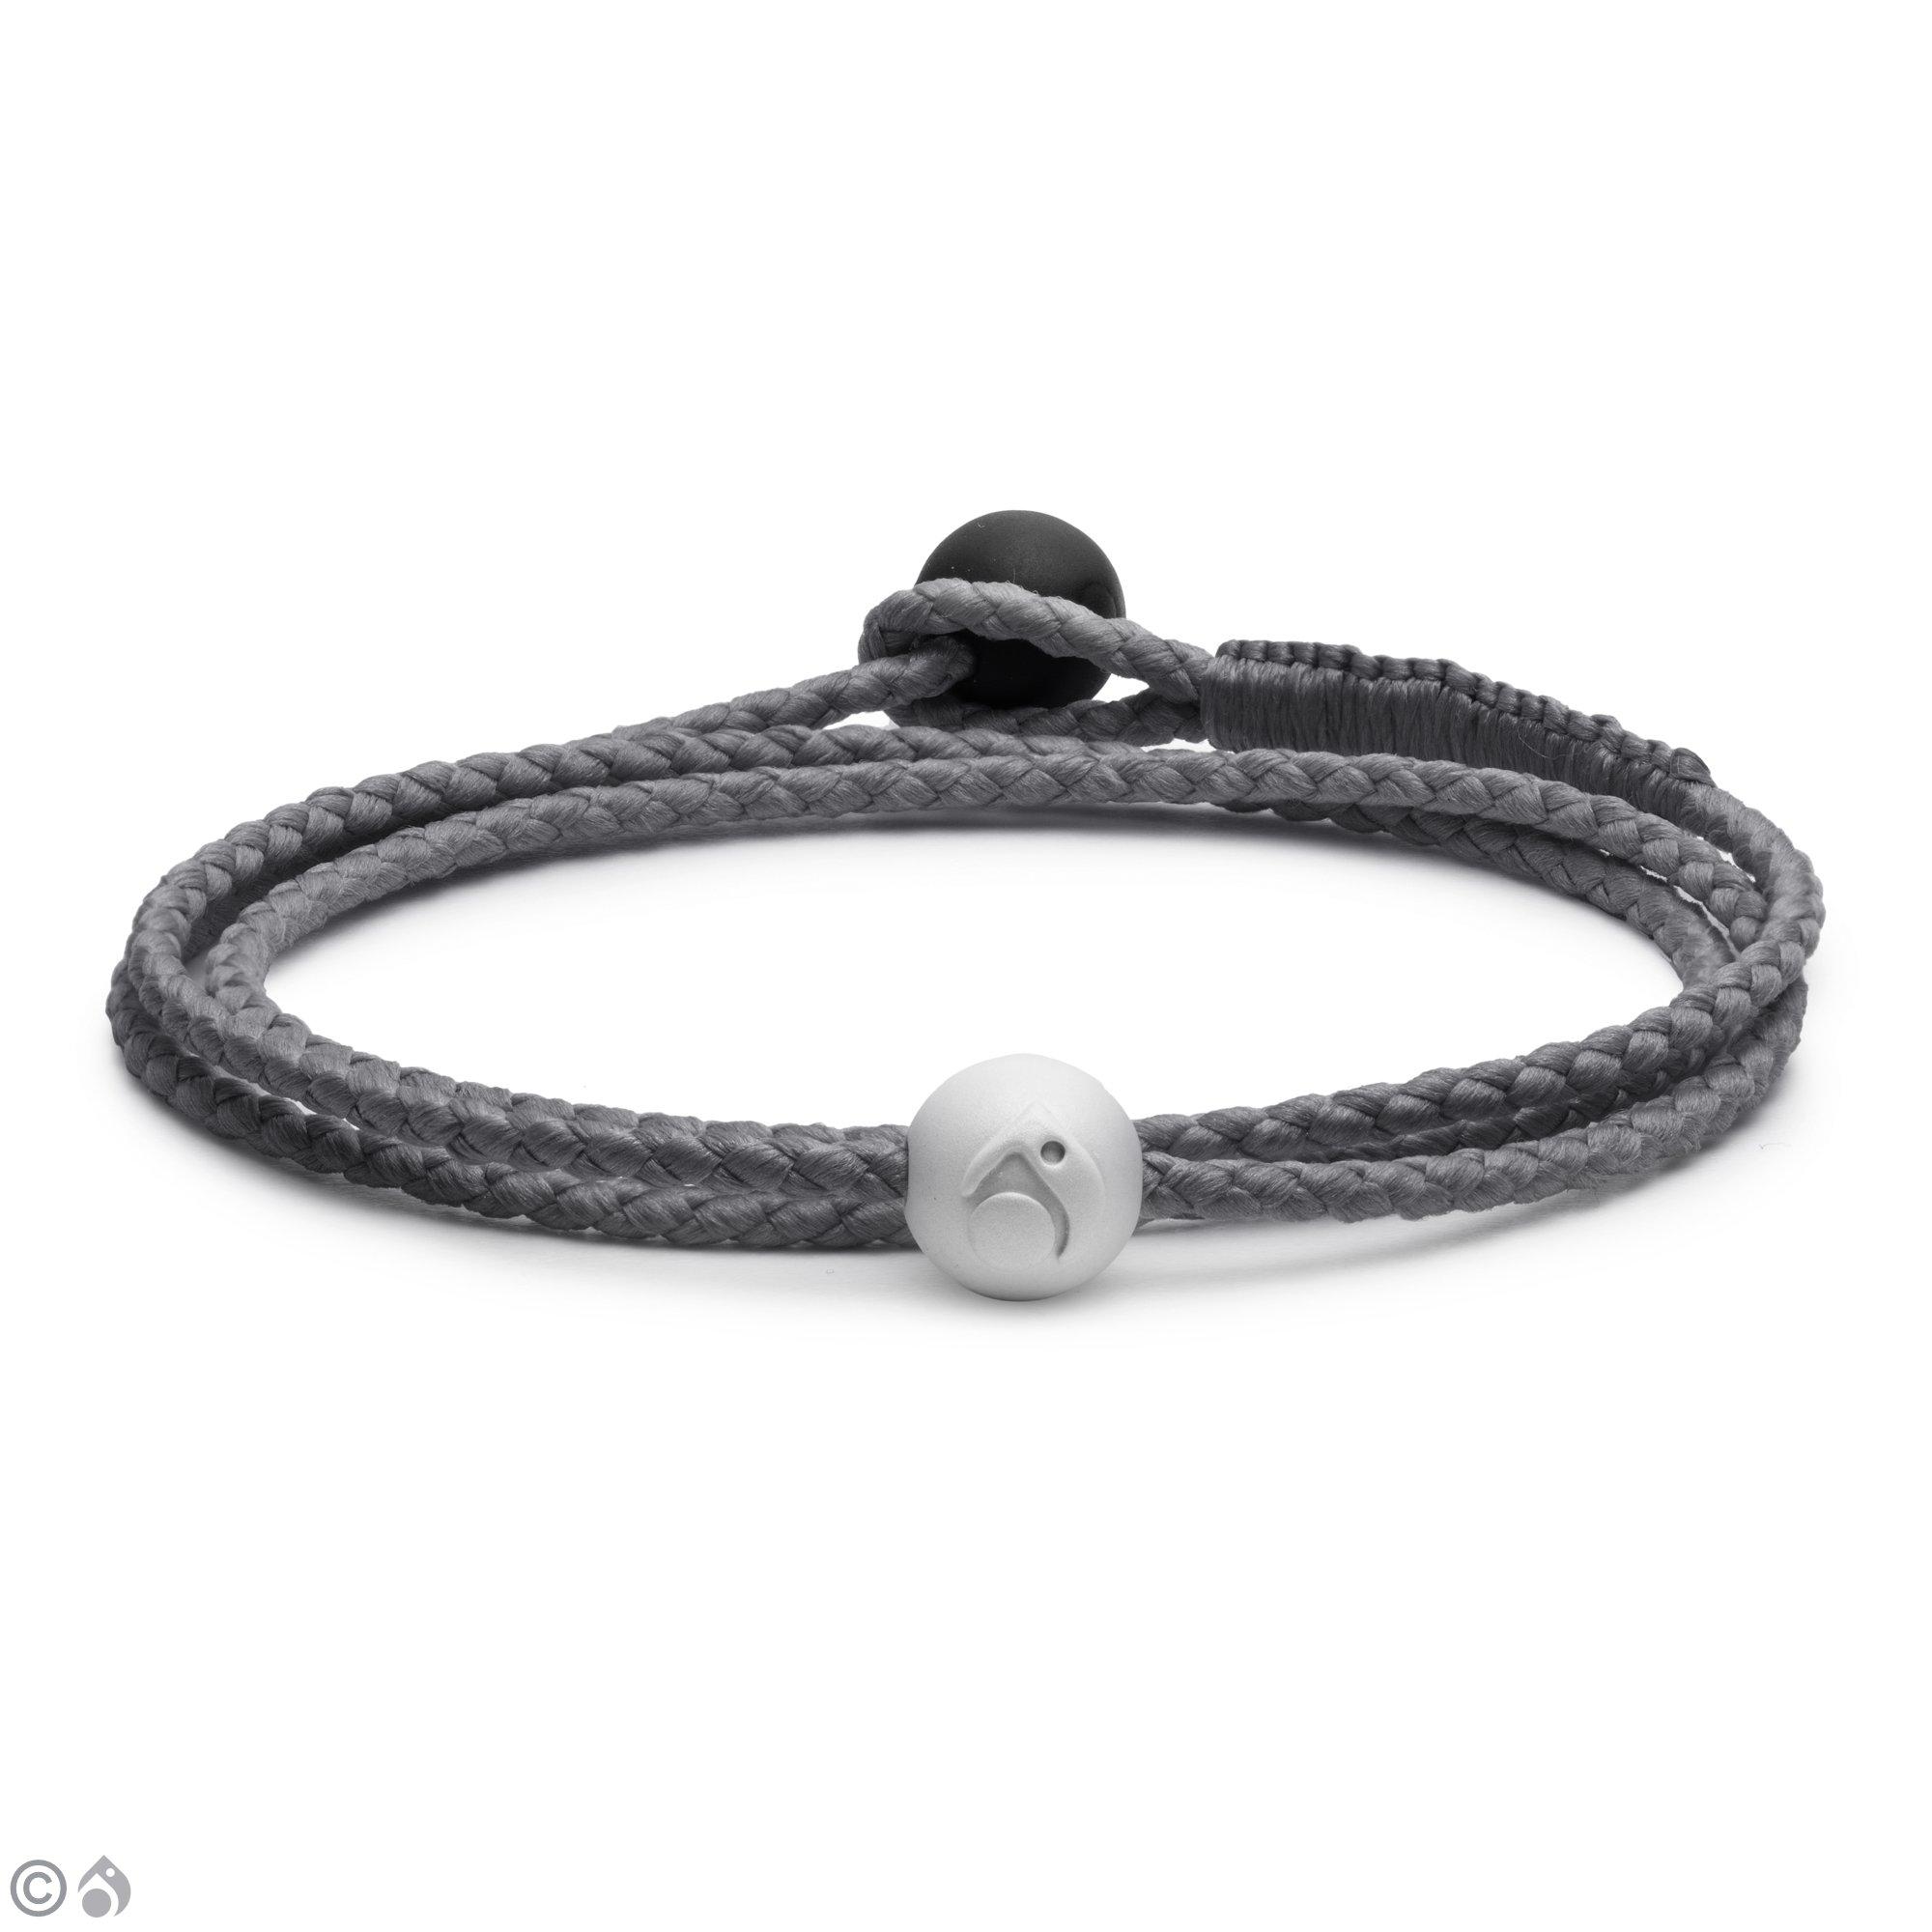 Lokai Triple Wrap Bracelet, Silver, 6.5'' - Medium by Lokai